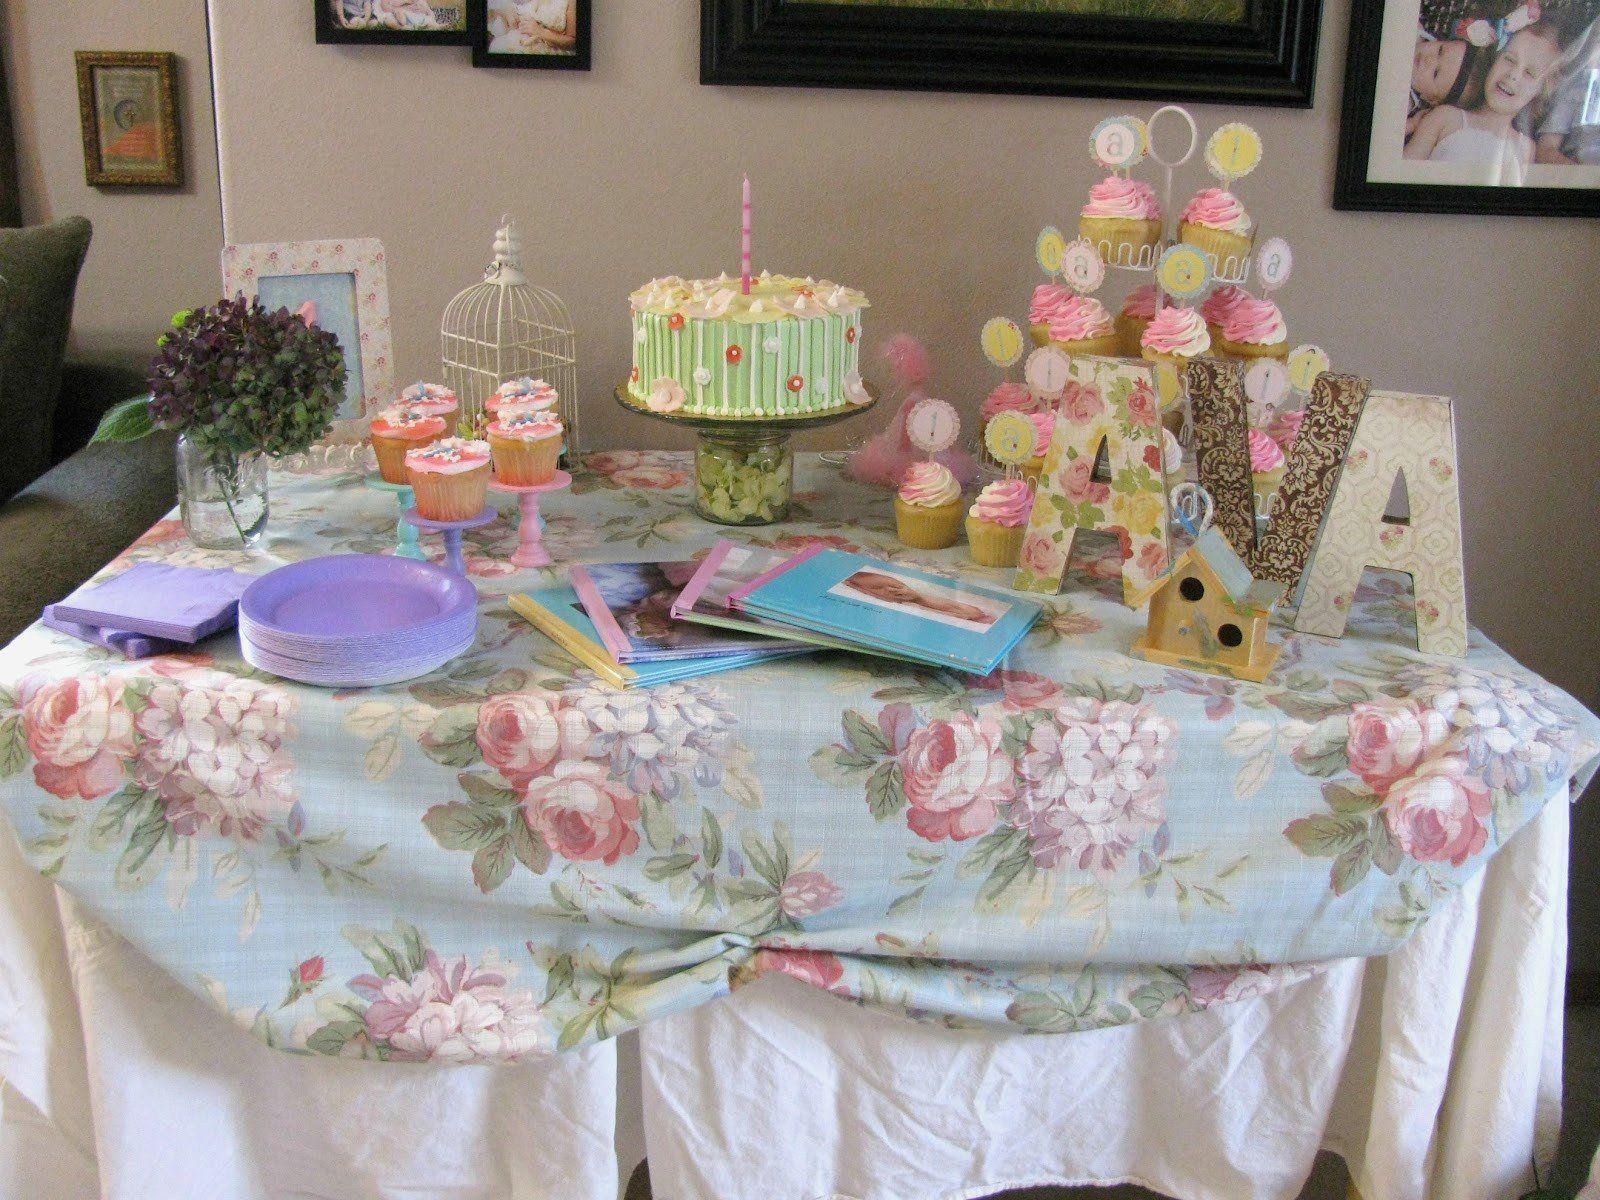 Bachelorette Decoration Ideas Awesome Simple Bachelorette Party Decoration Idea Cake Table Decorations Birthday Elegant Birthday Party Bachelorette Decorations